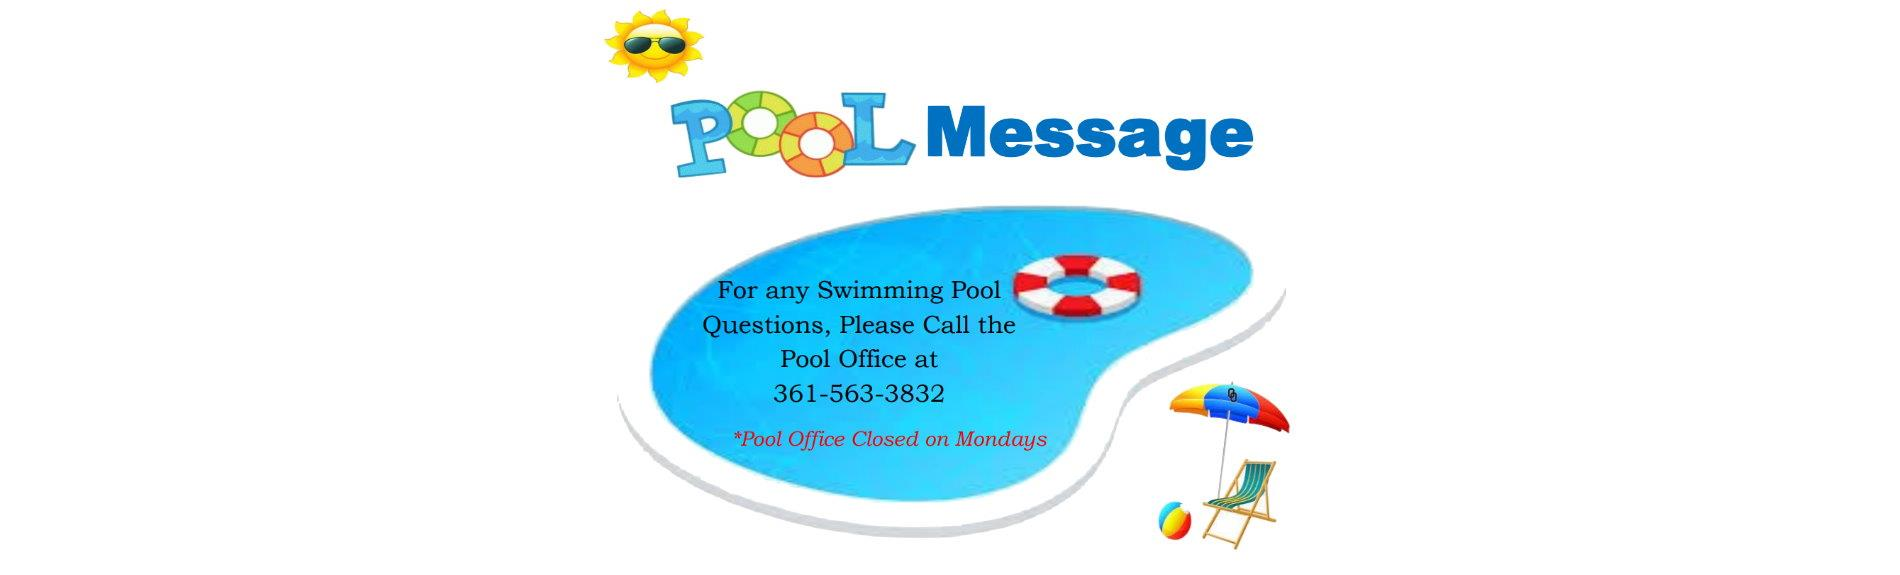 Pool Information